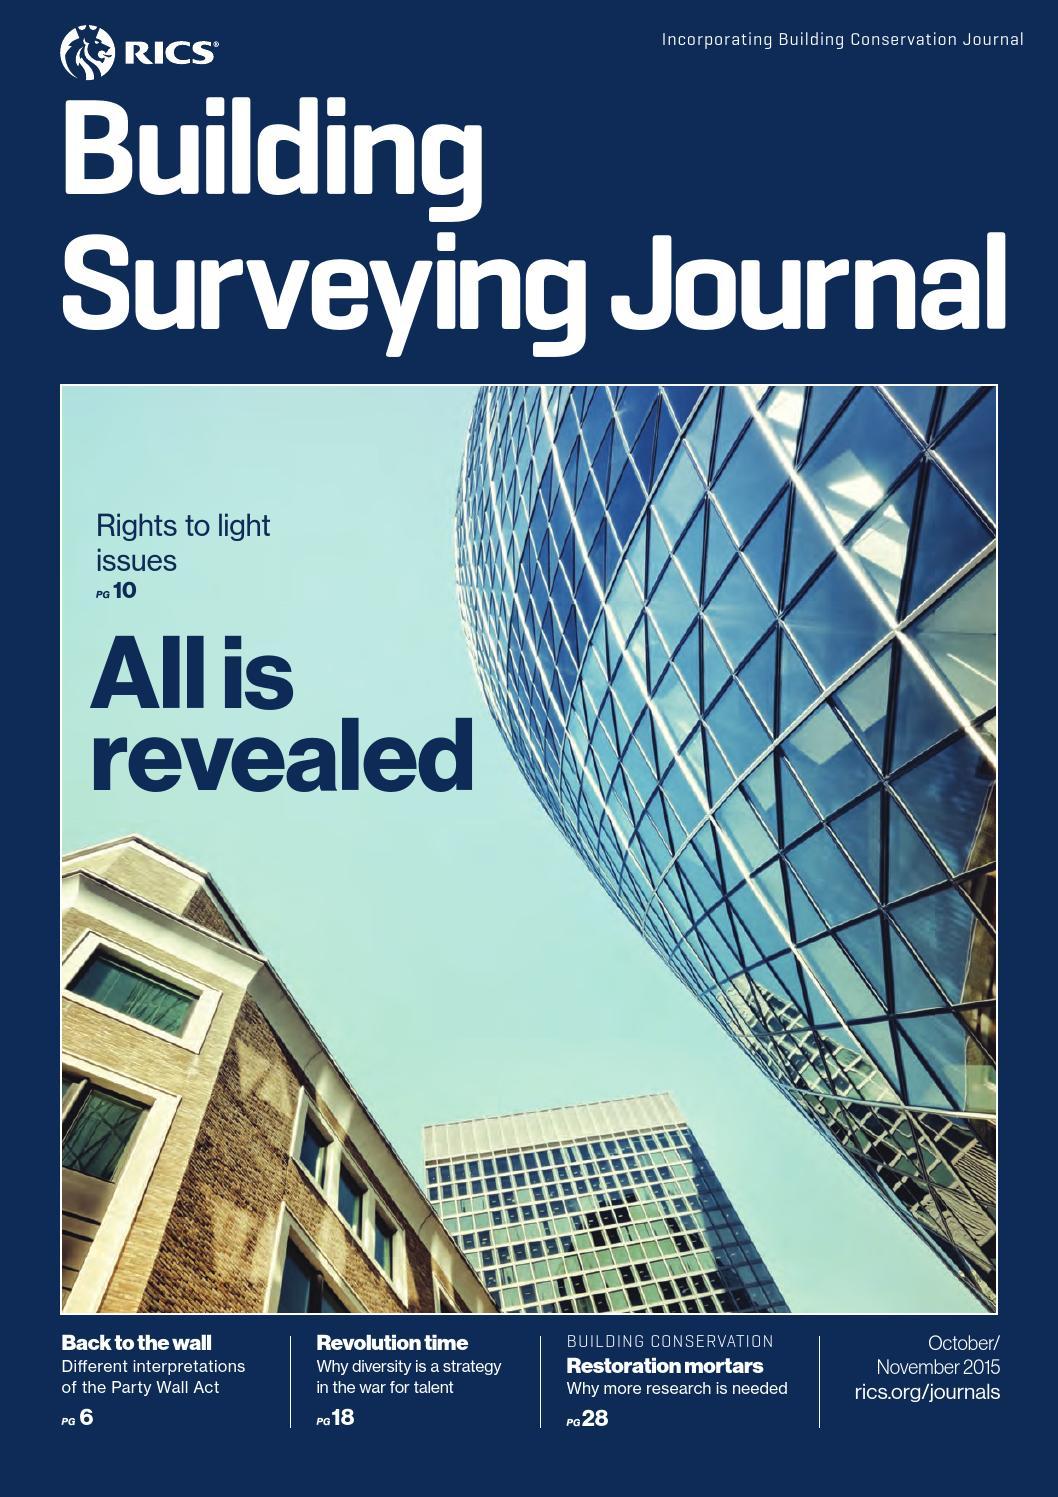 Building Surveying Journal October November 2015 By Rics